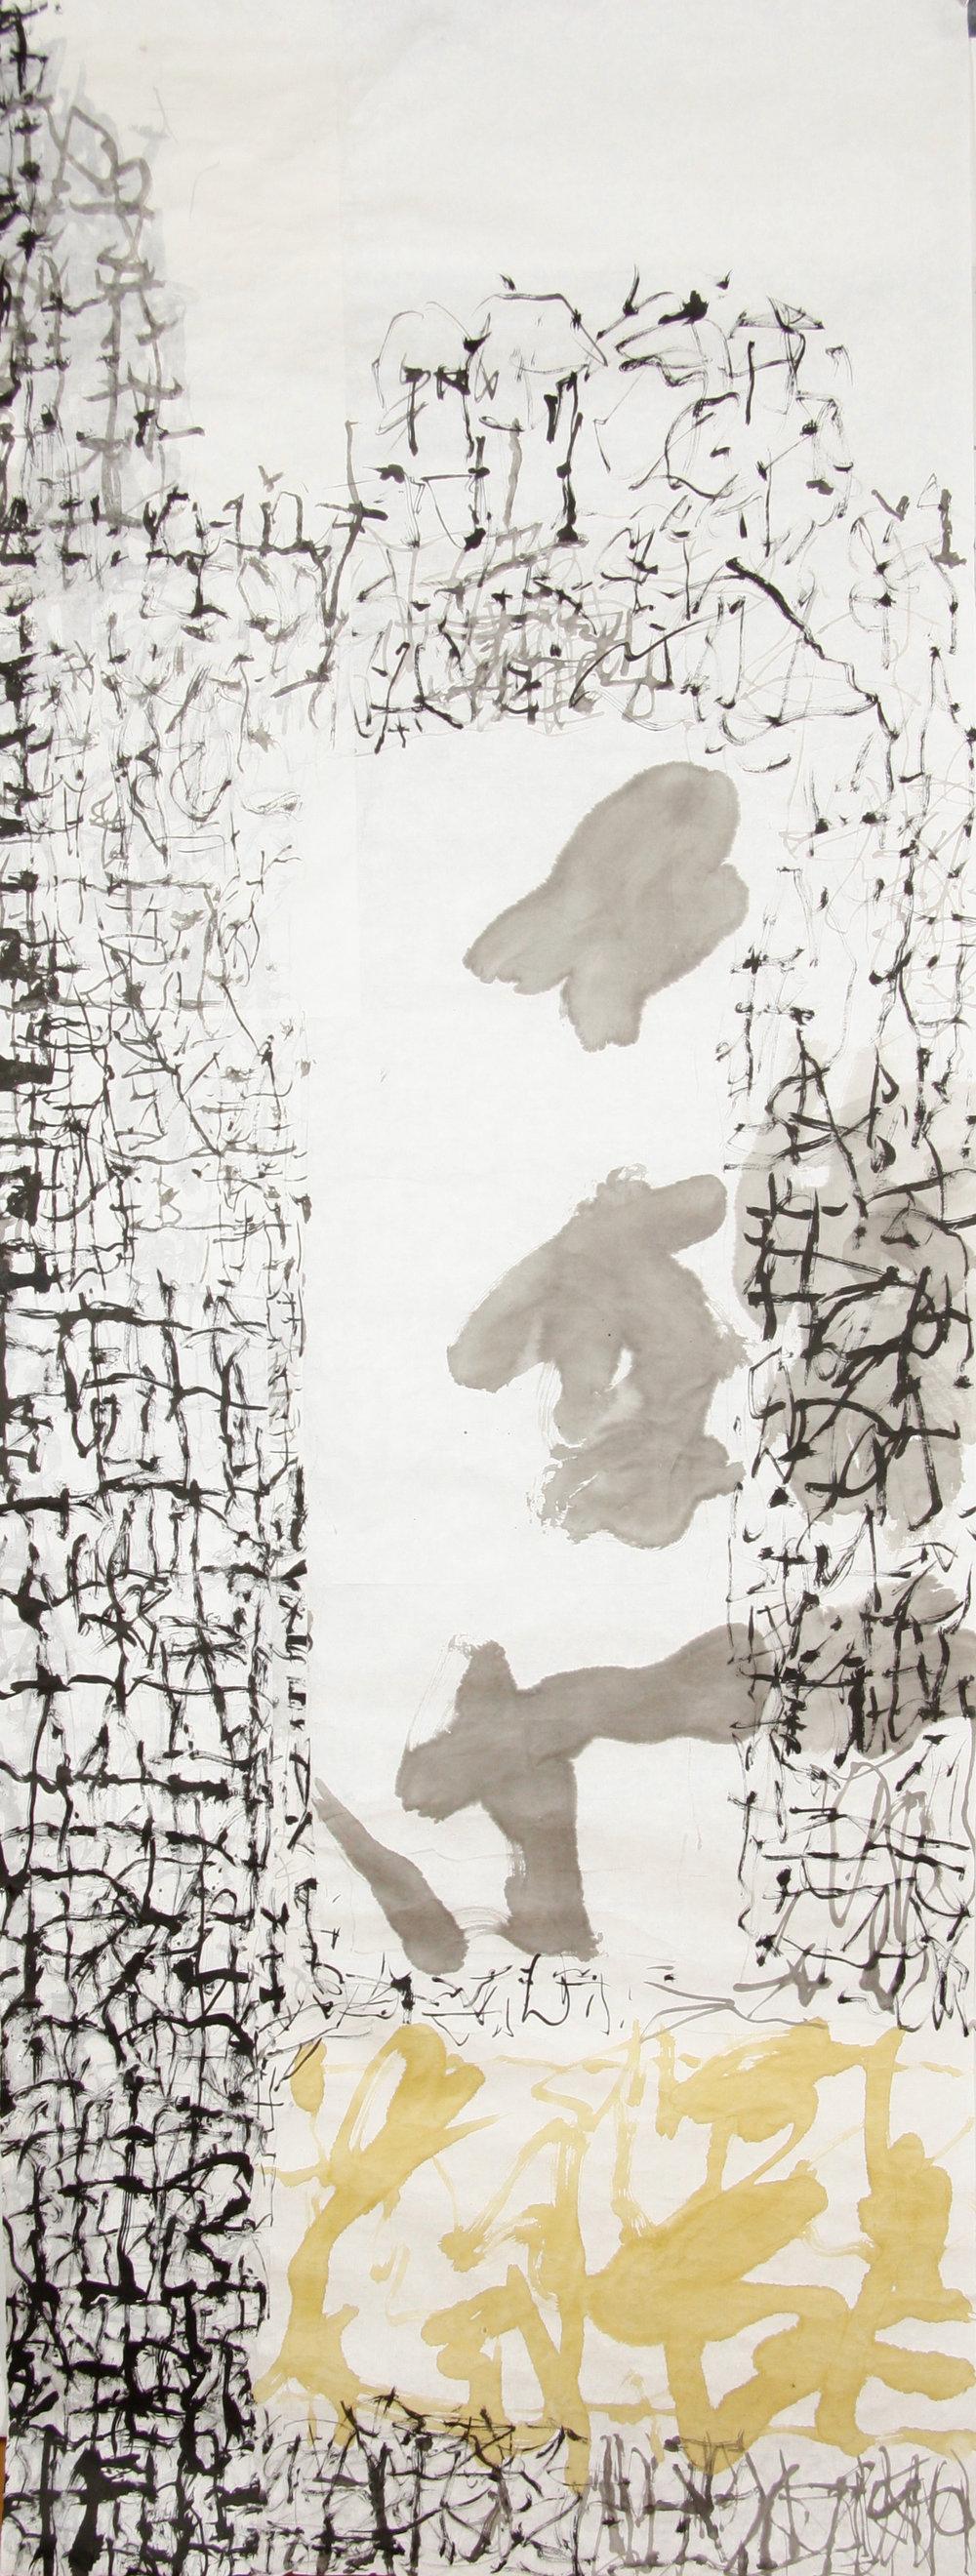 2018 6th January 178cmx69cm ink on ricepaper large.jpg